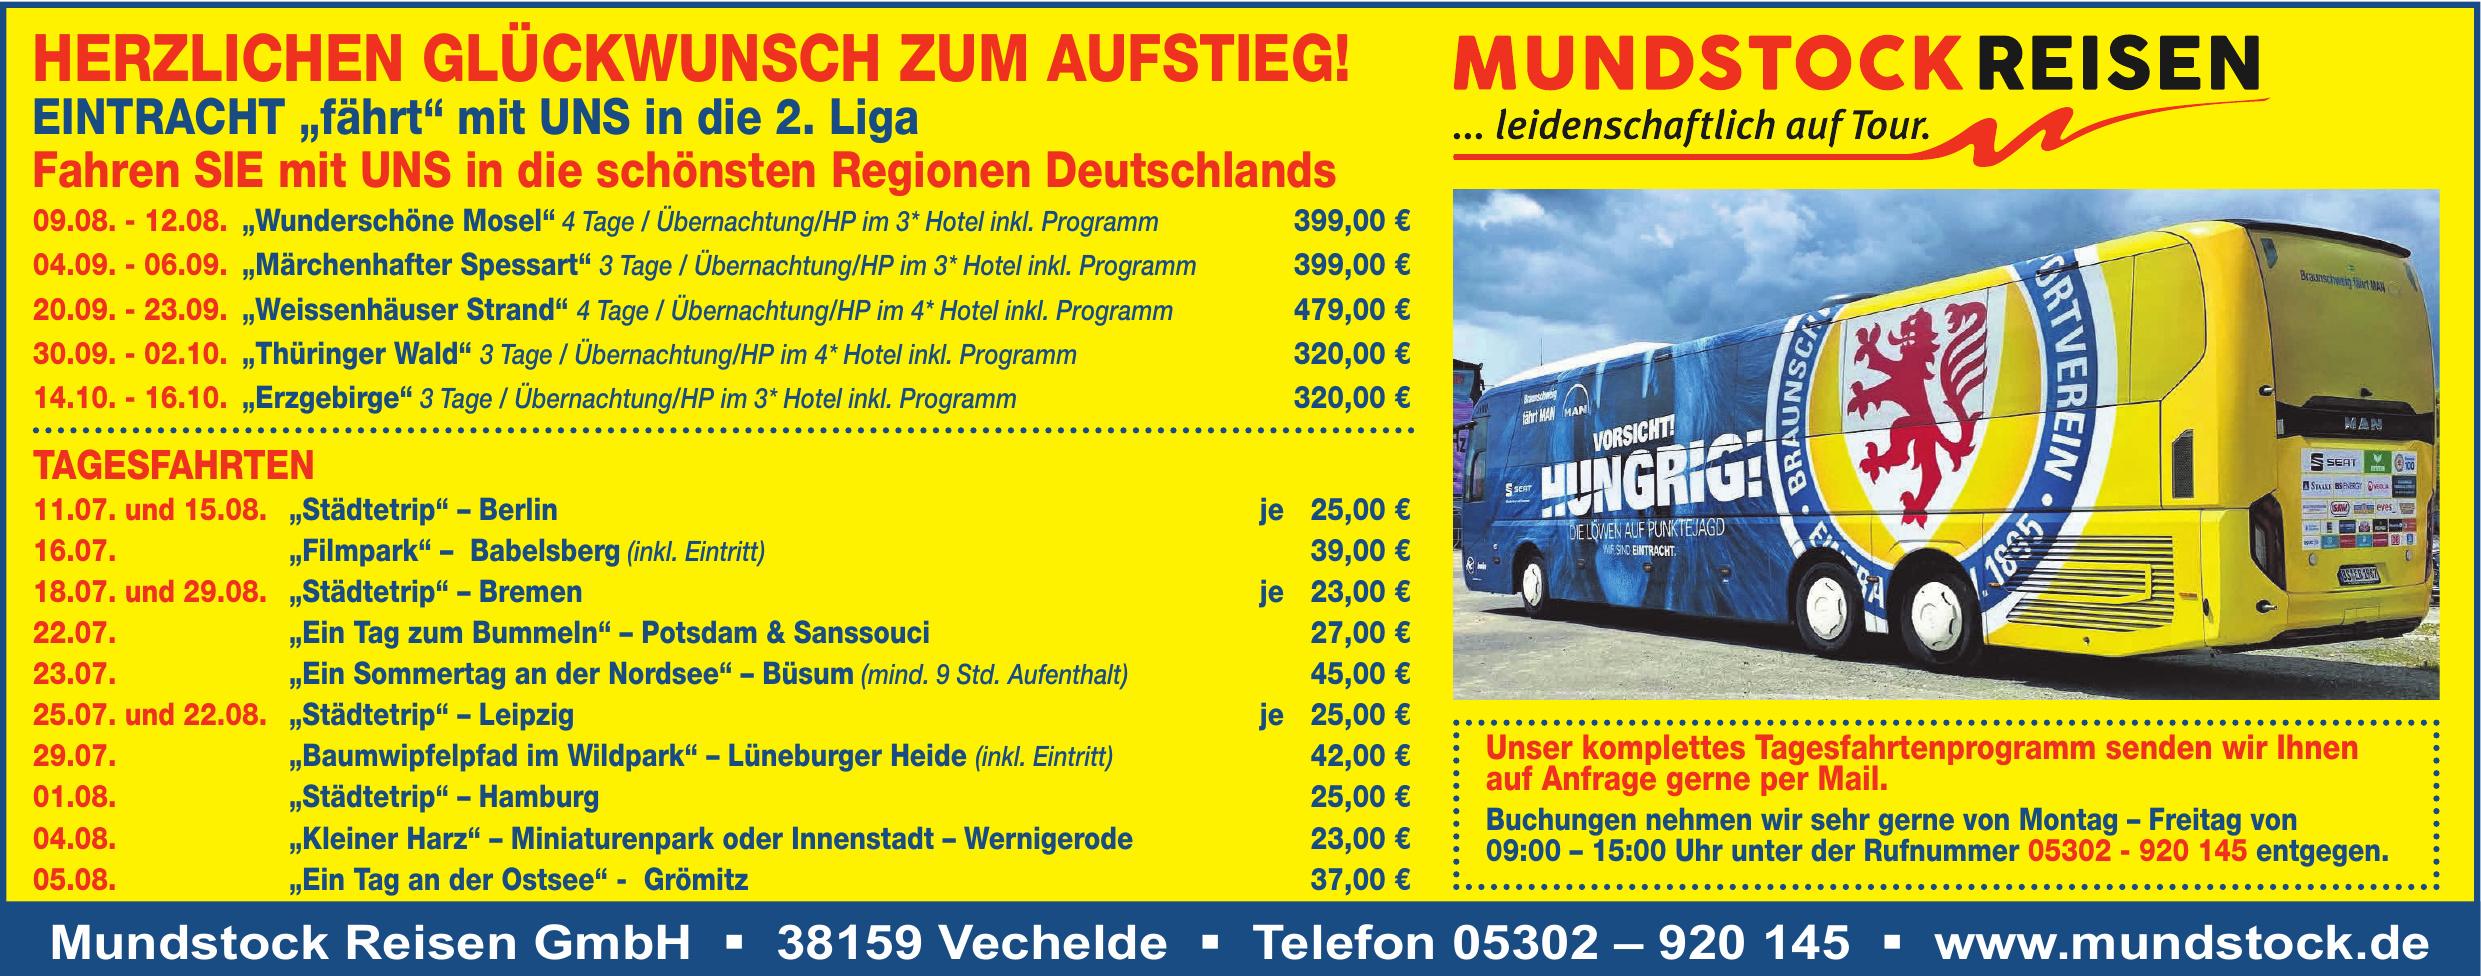 Mundstock Reisen GmbH